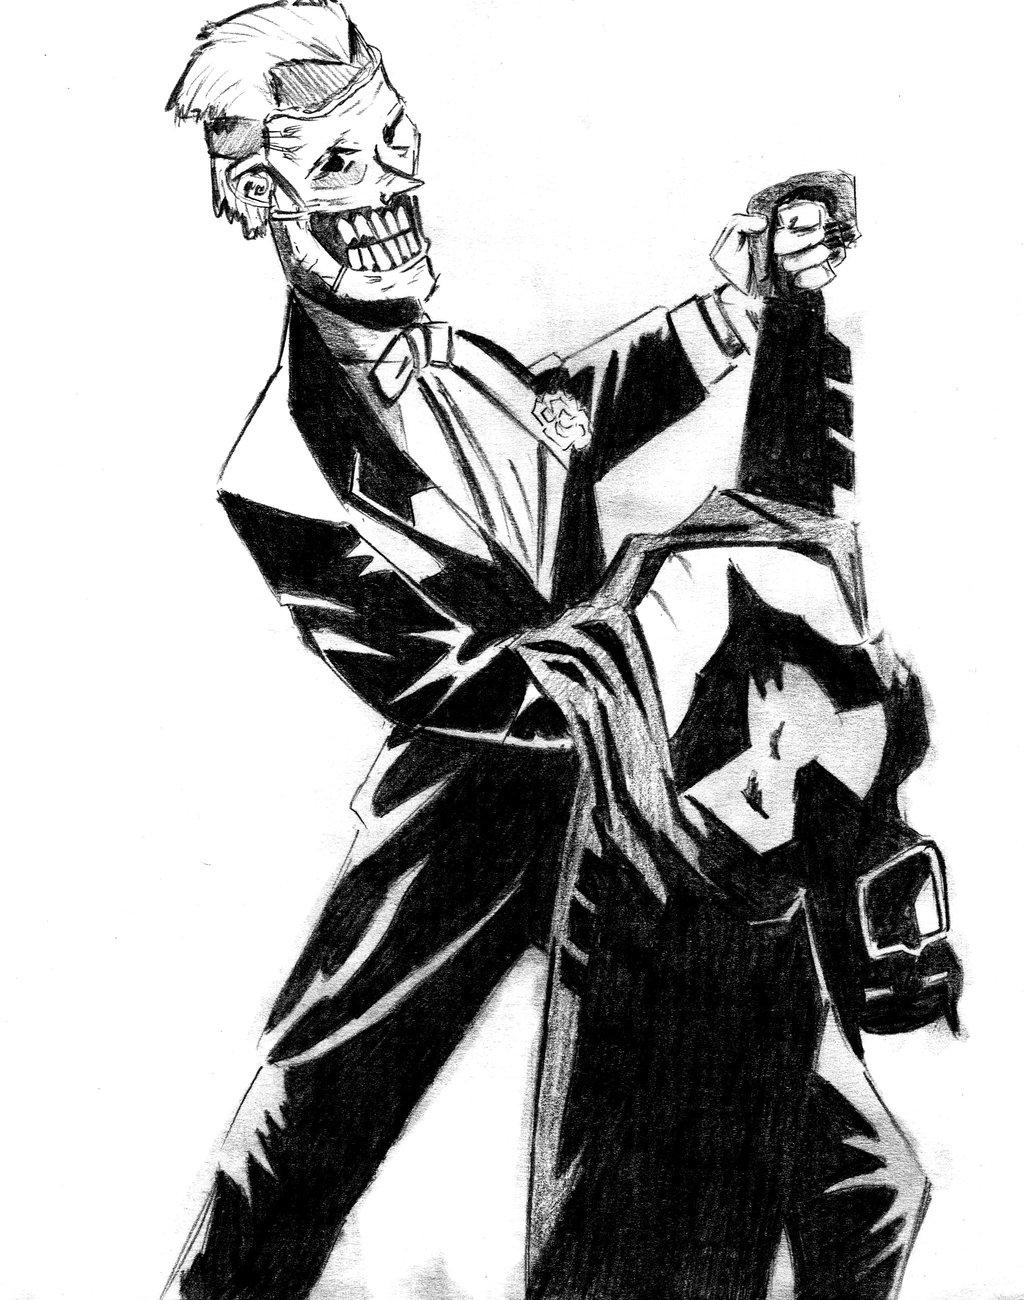 1024x1300 Here's A Joker Drawing I Did A Few Months Ago. Batman